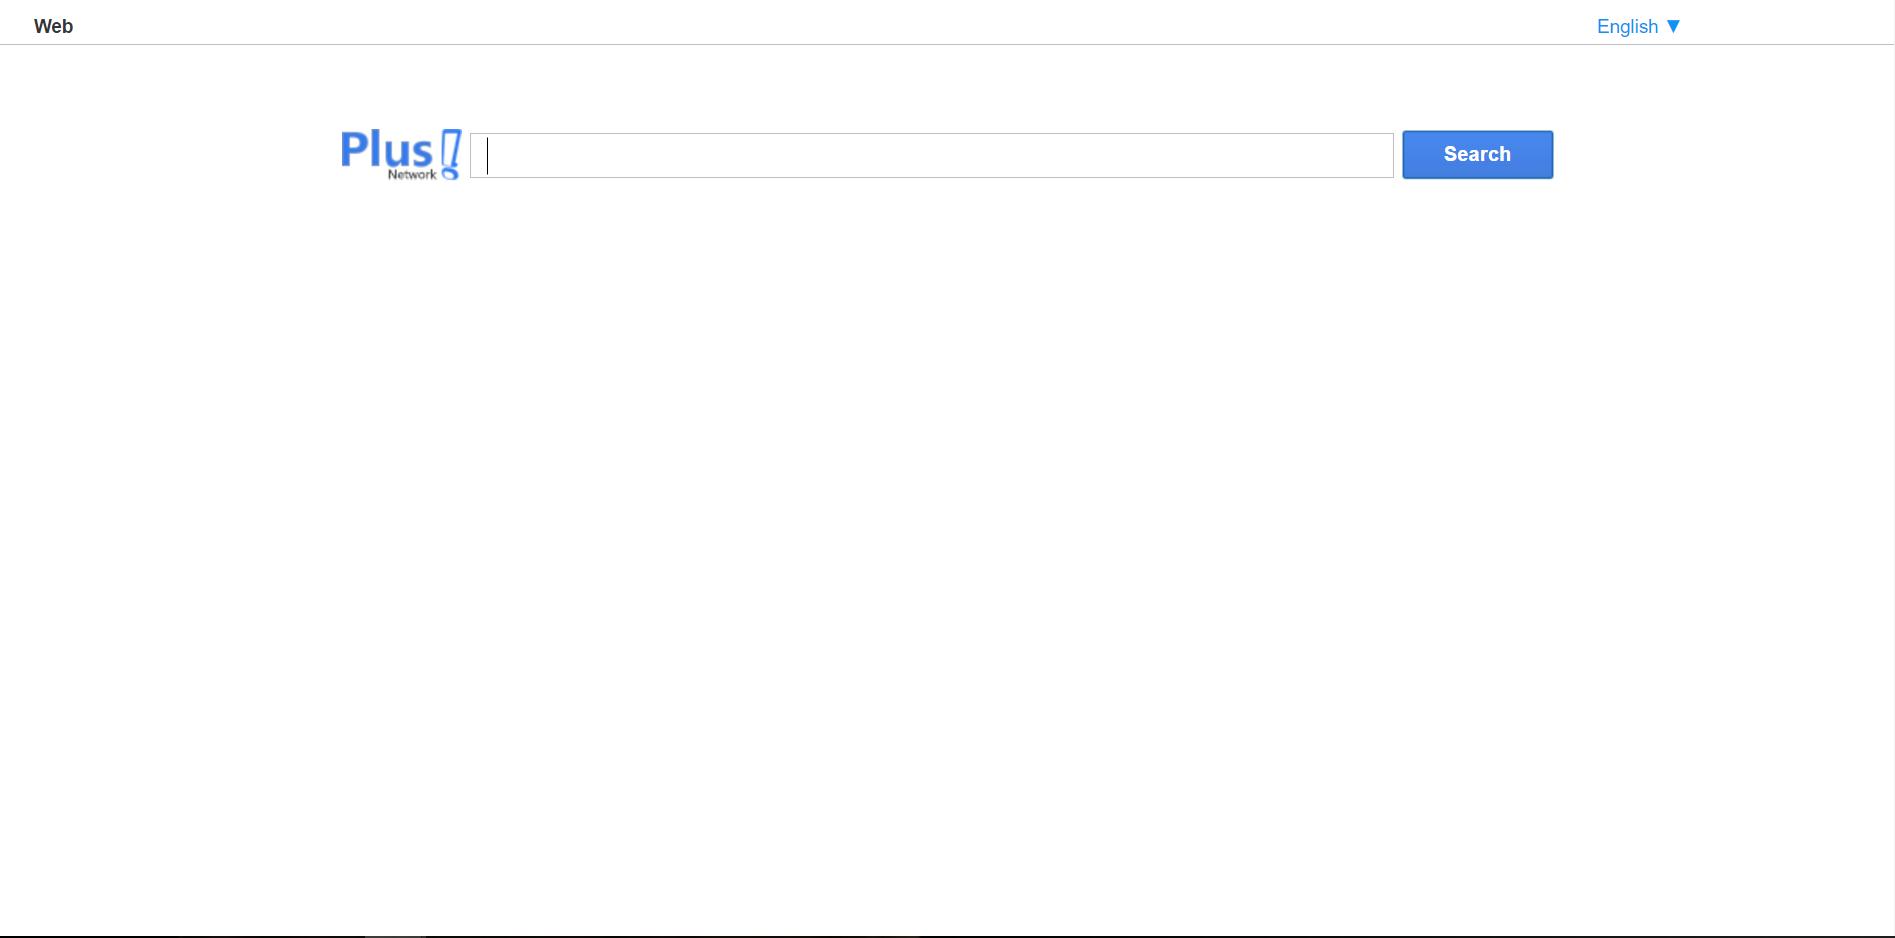 plusnetwork.com-browser-hijacker-homepage-bestsecuritysearch